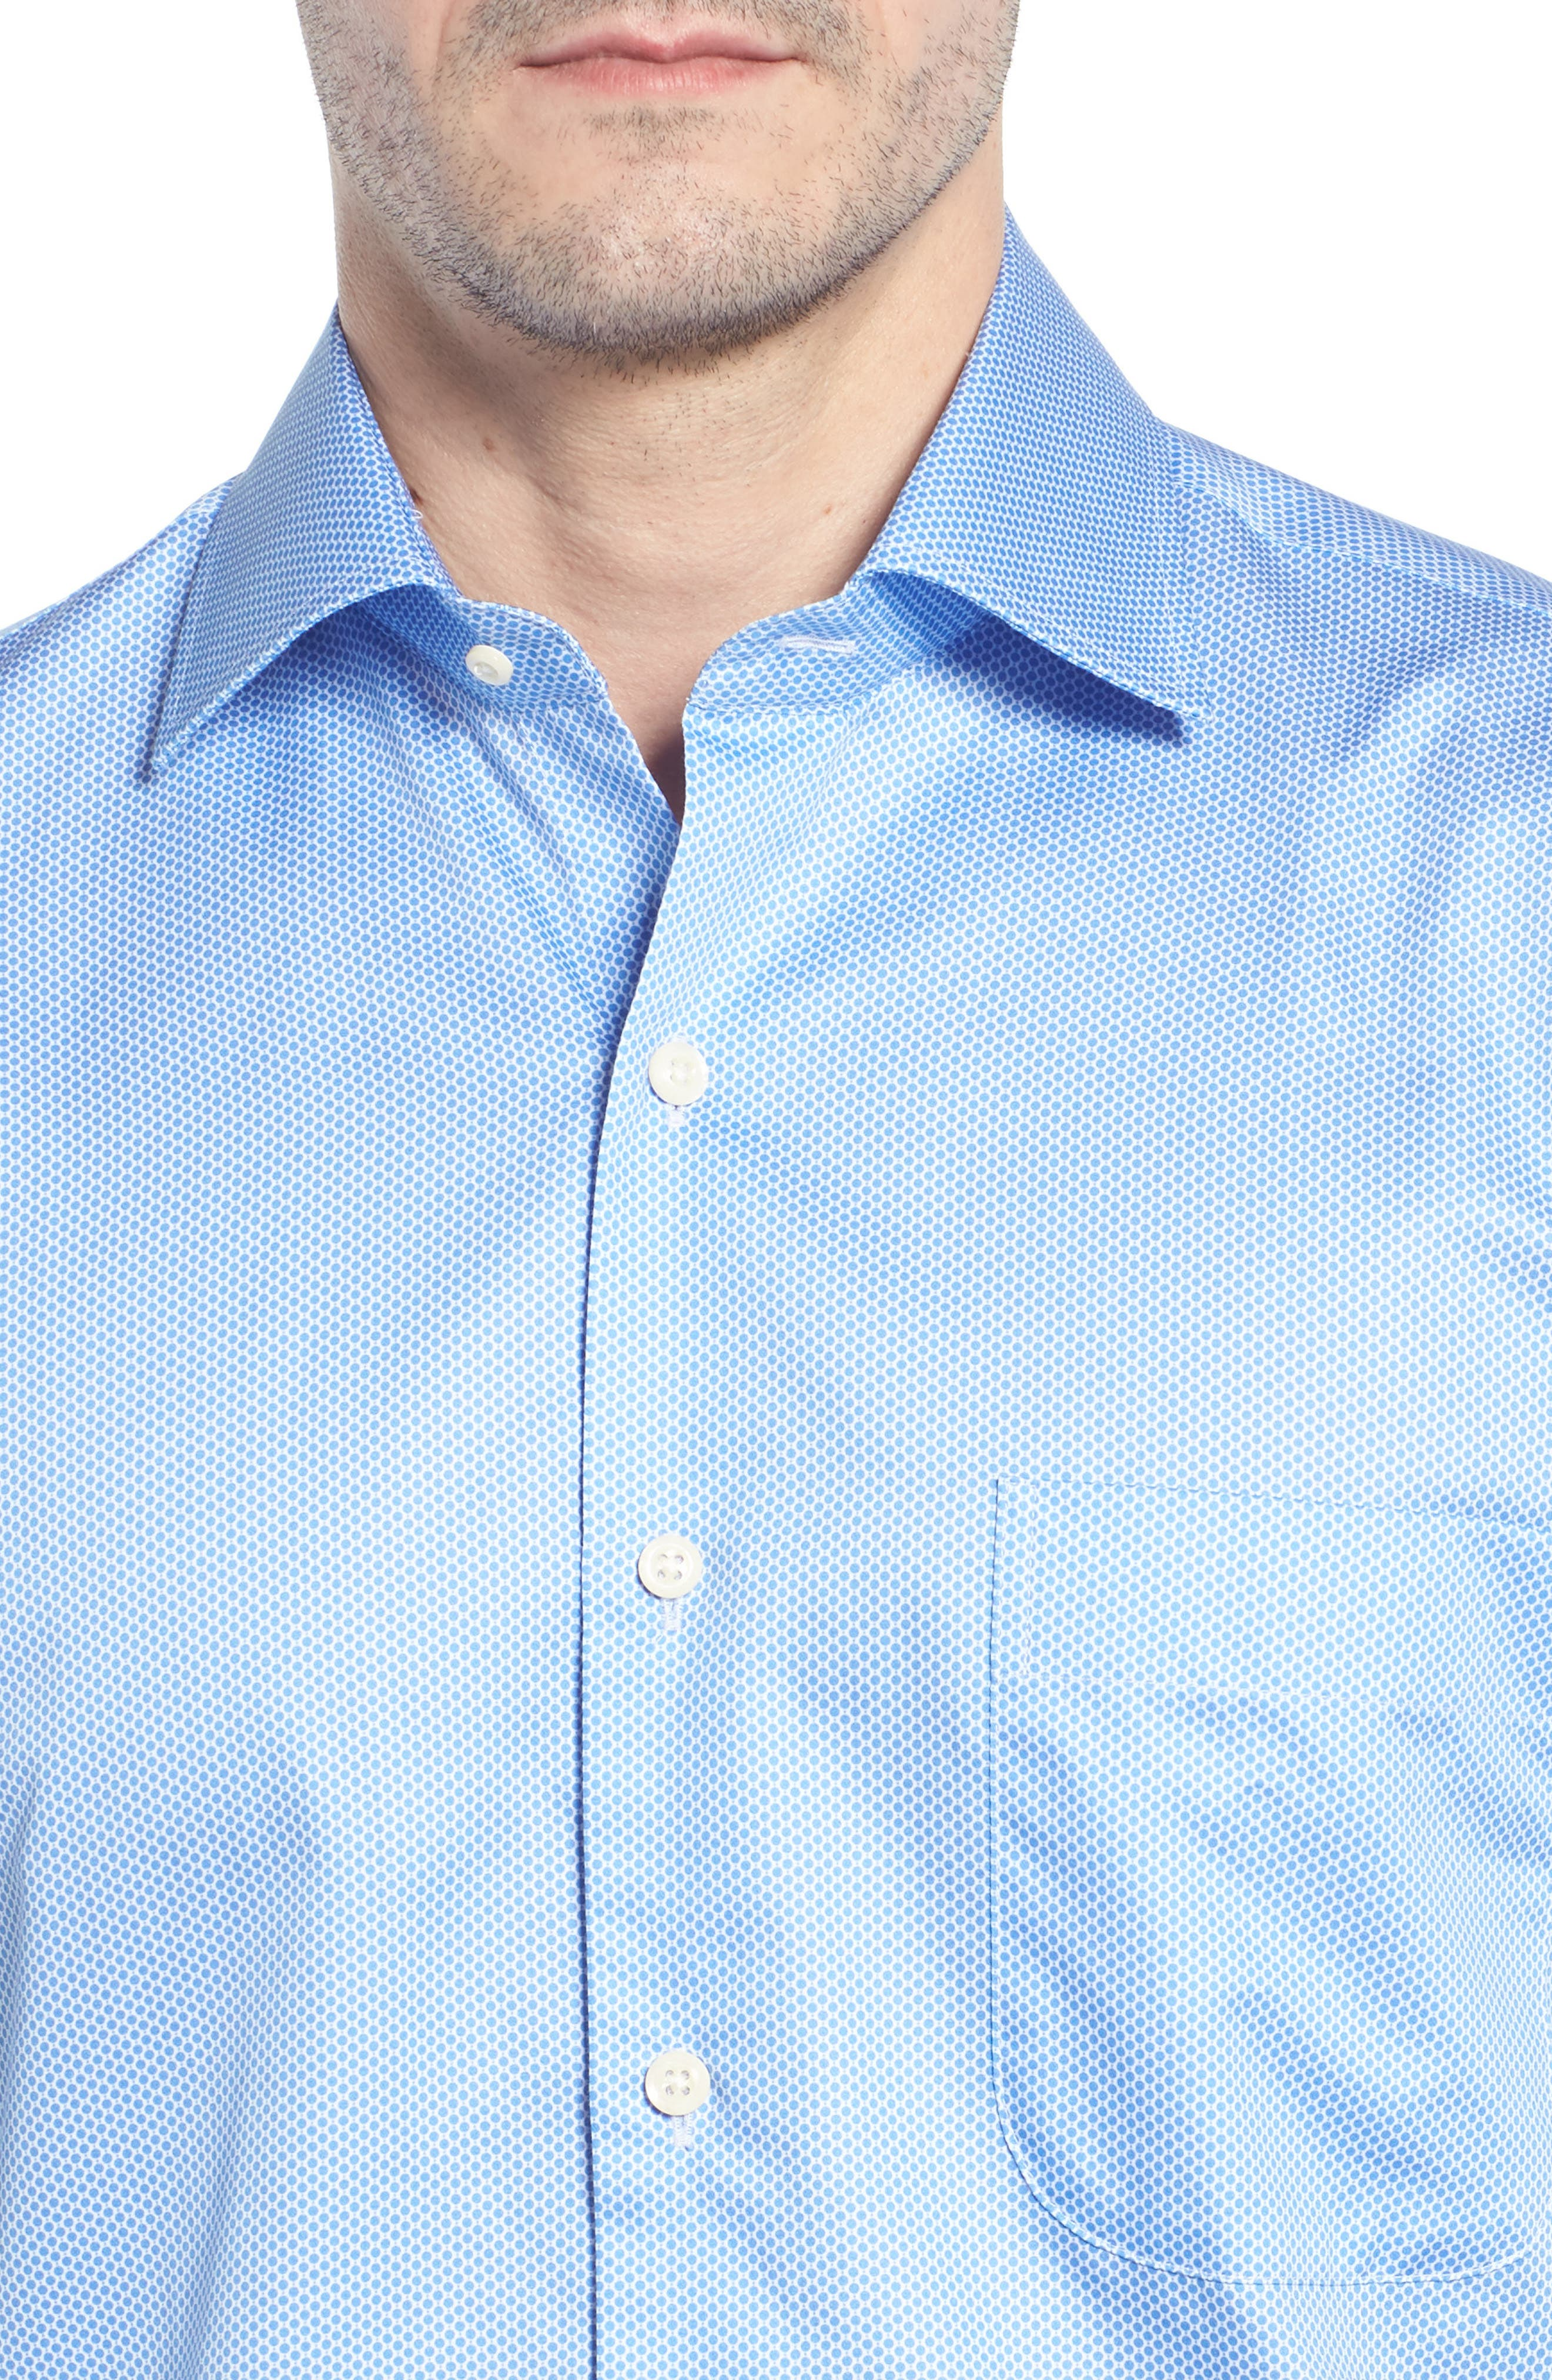 Crown Ease Connecting the Dots Sport Shirt,                             Alternate thumbnail 2, color,                             Atlas Blue